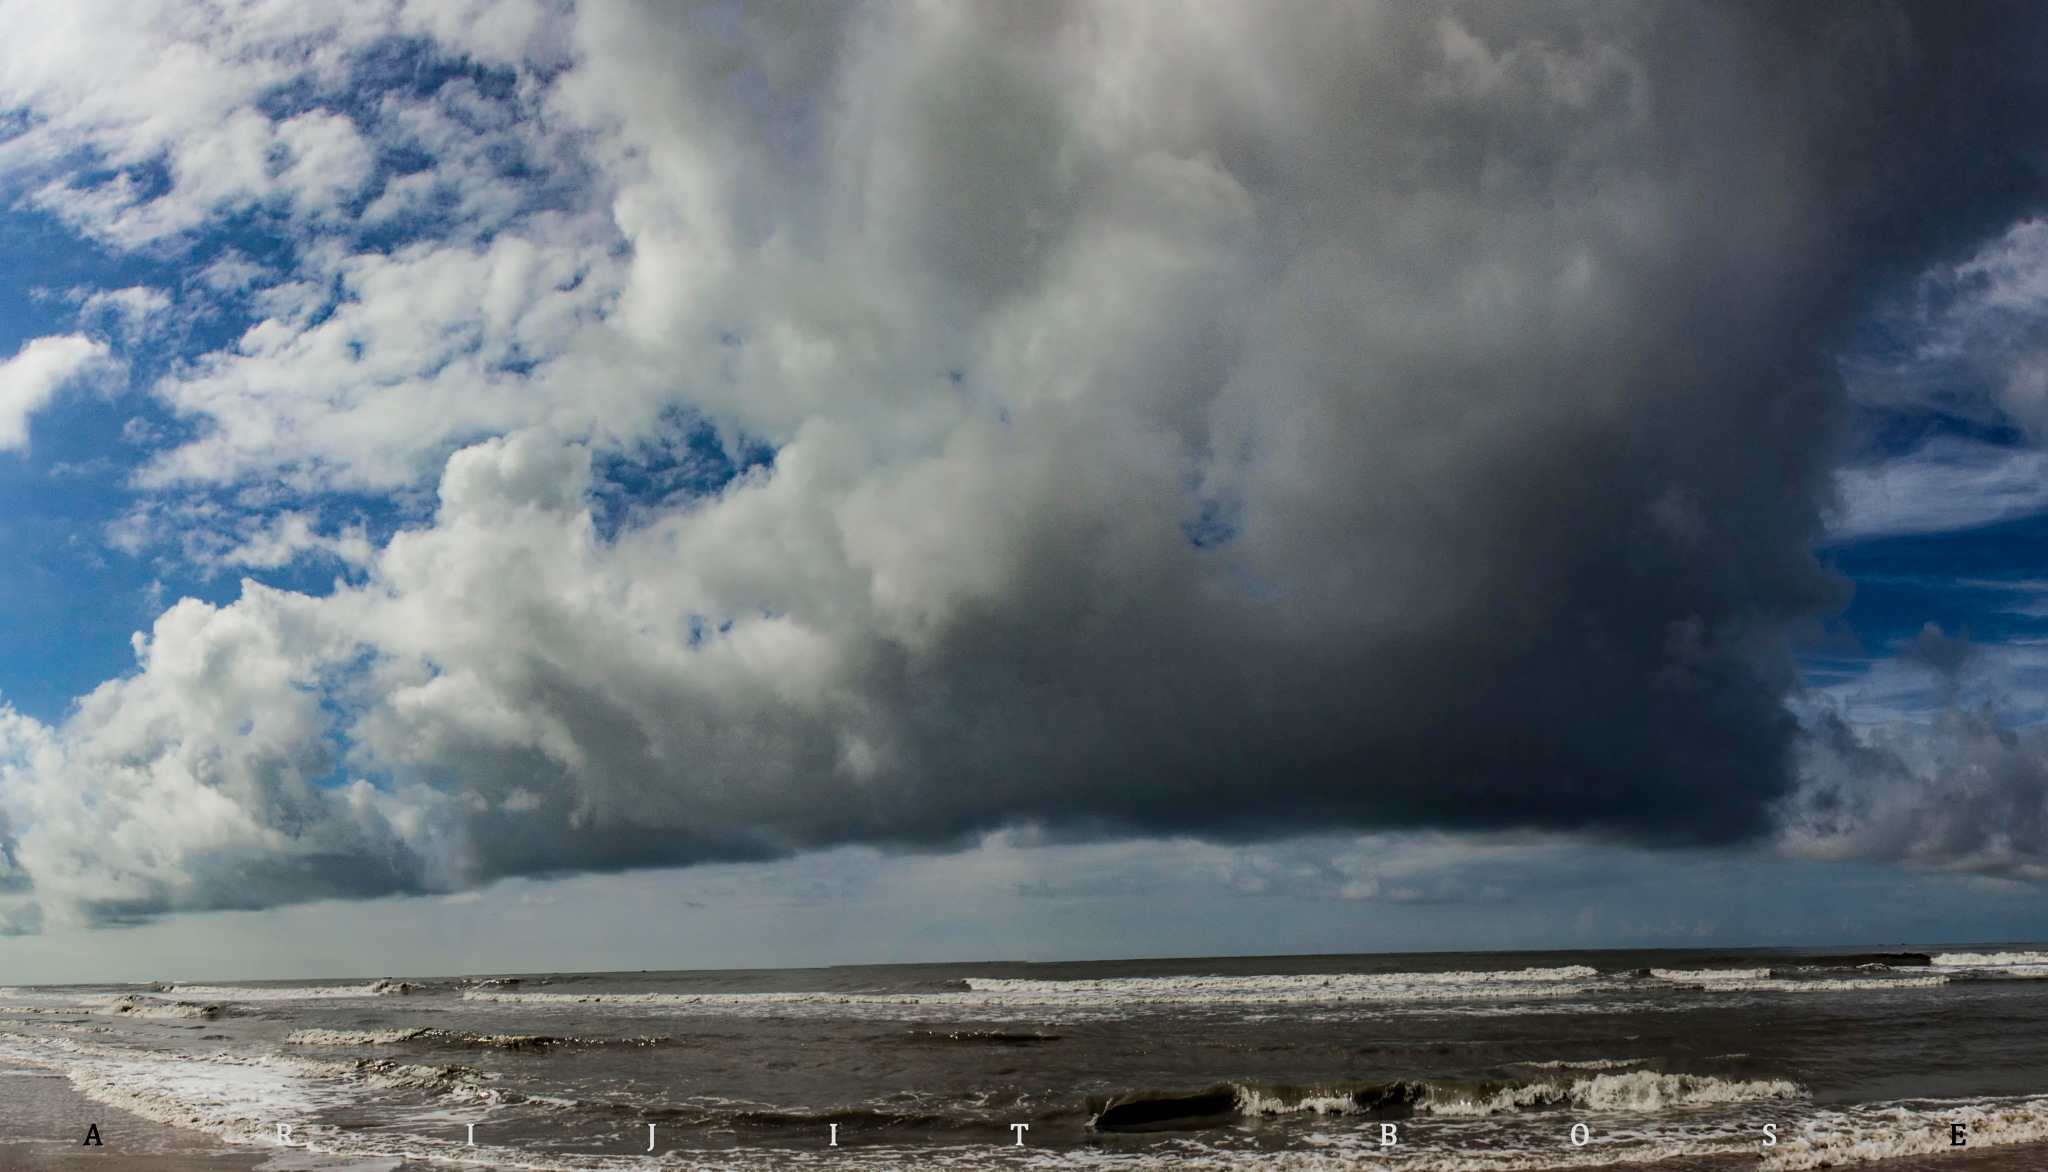 Tajpur seashore. by ArijitBose